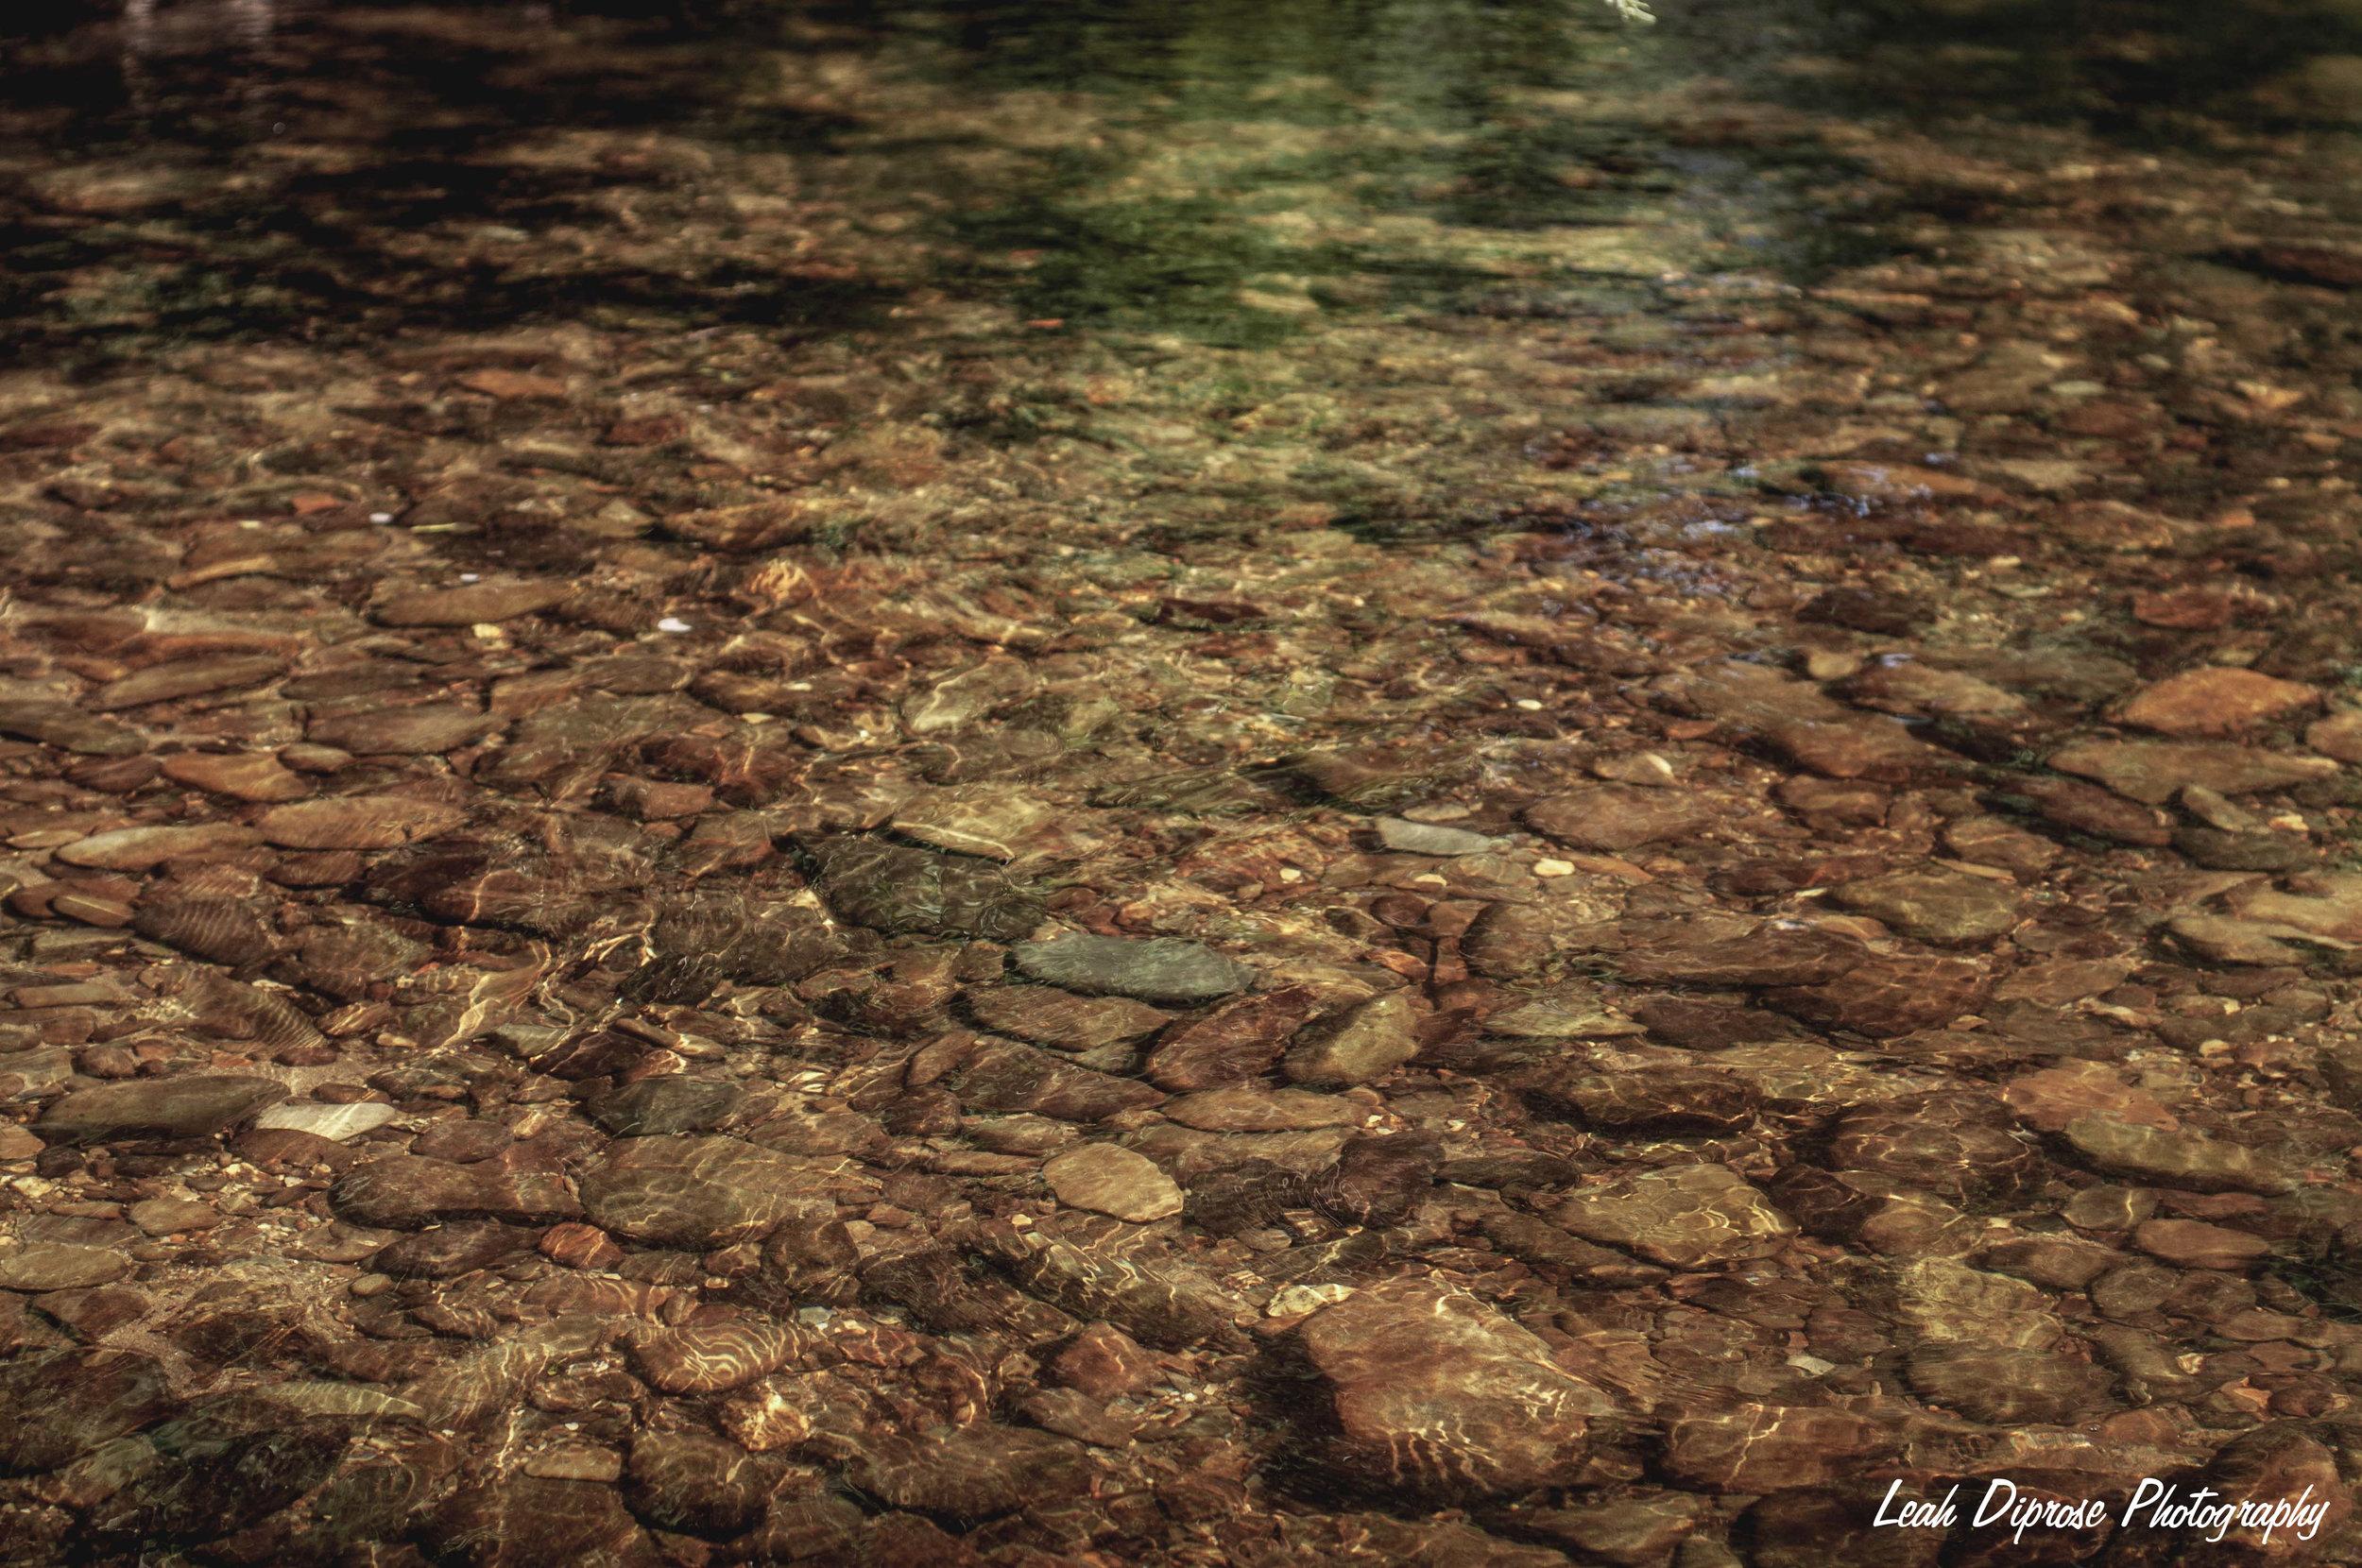 Leah Diprose Photography image-6195.jpg